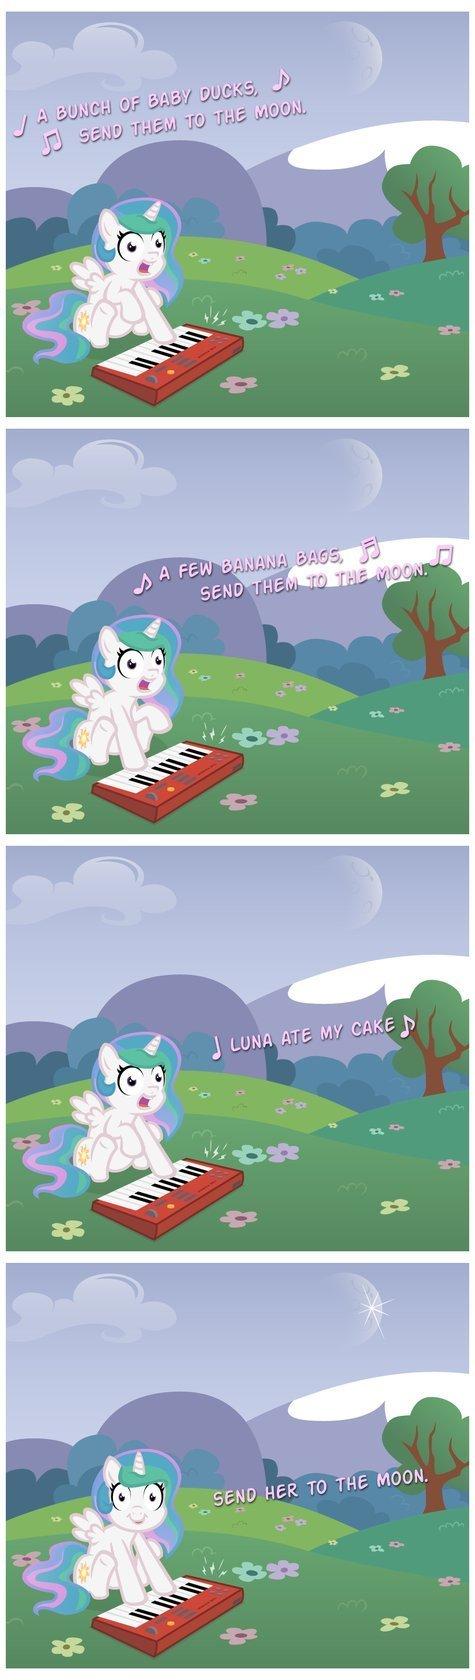 Celestia is a sociopath. broccolimeansfun.deviantart.com/art/P.... ponies comic